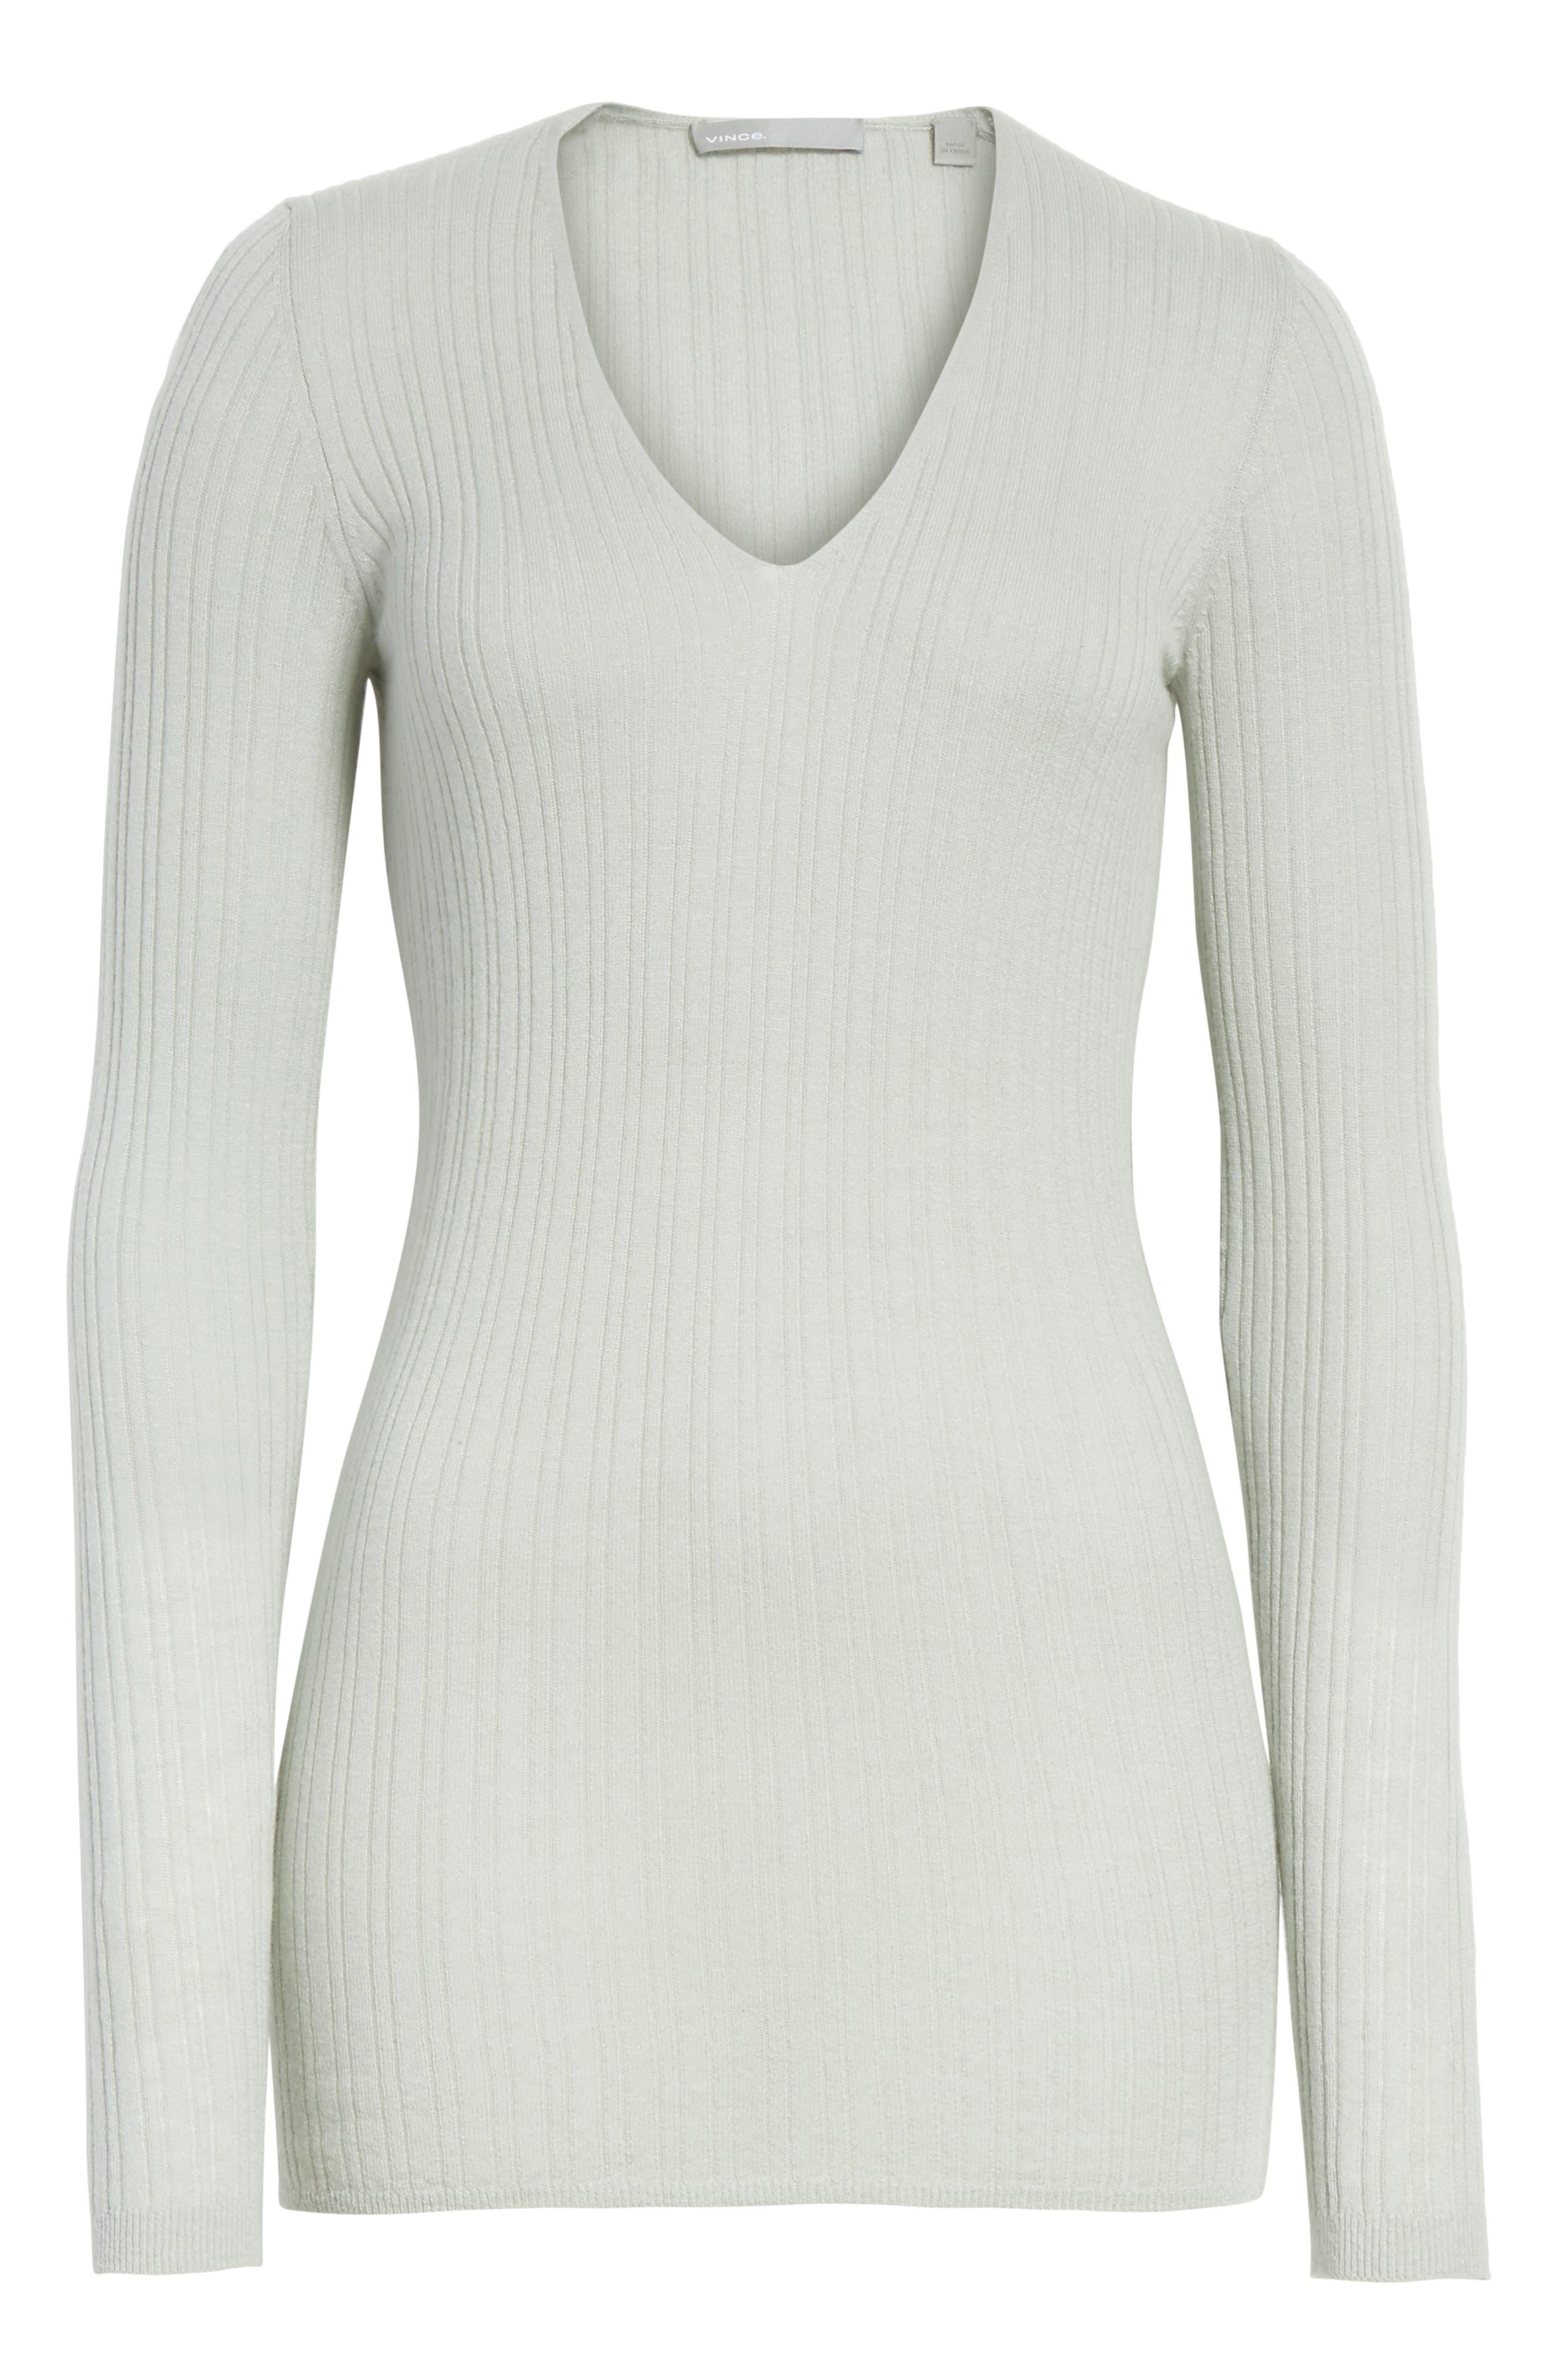 Ribbed Cashmere V-Neck Sweater,                             Alternate thumbnail 18, color,